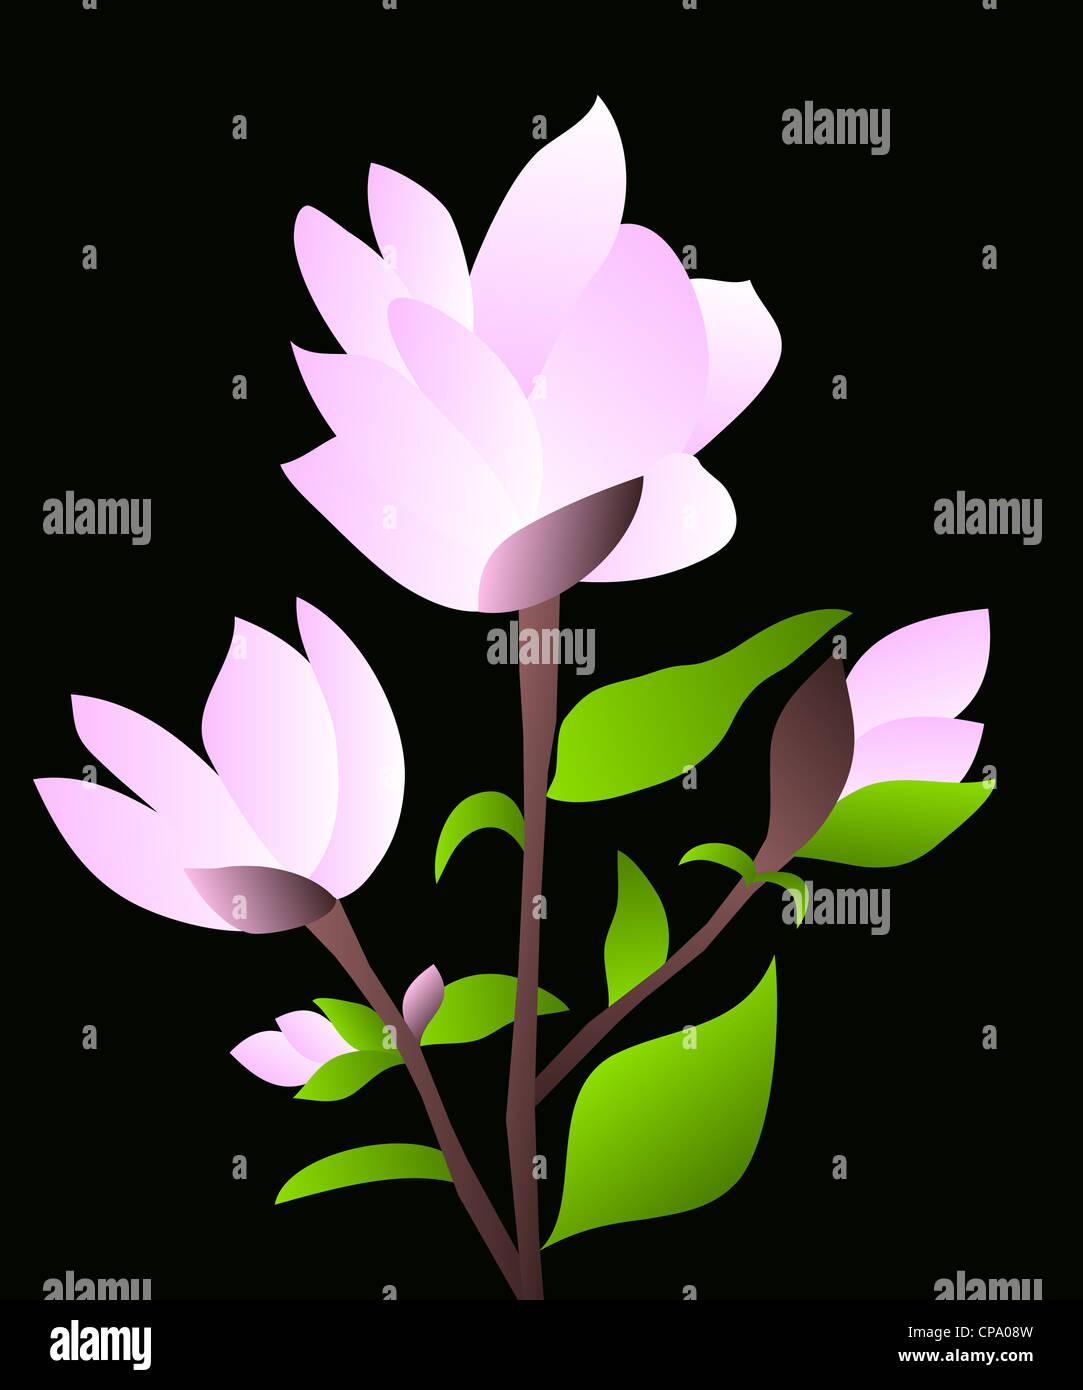 Pink magnolia flowering plant illustration on black background Stock Photo